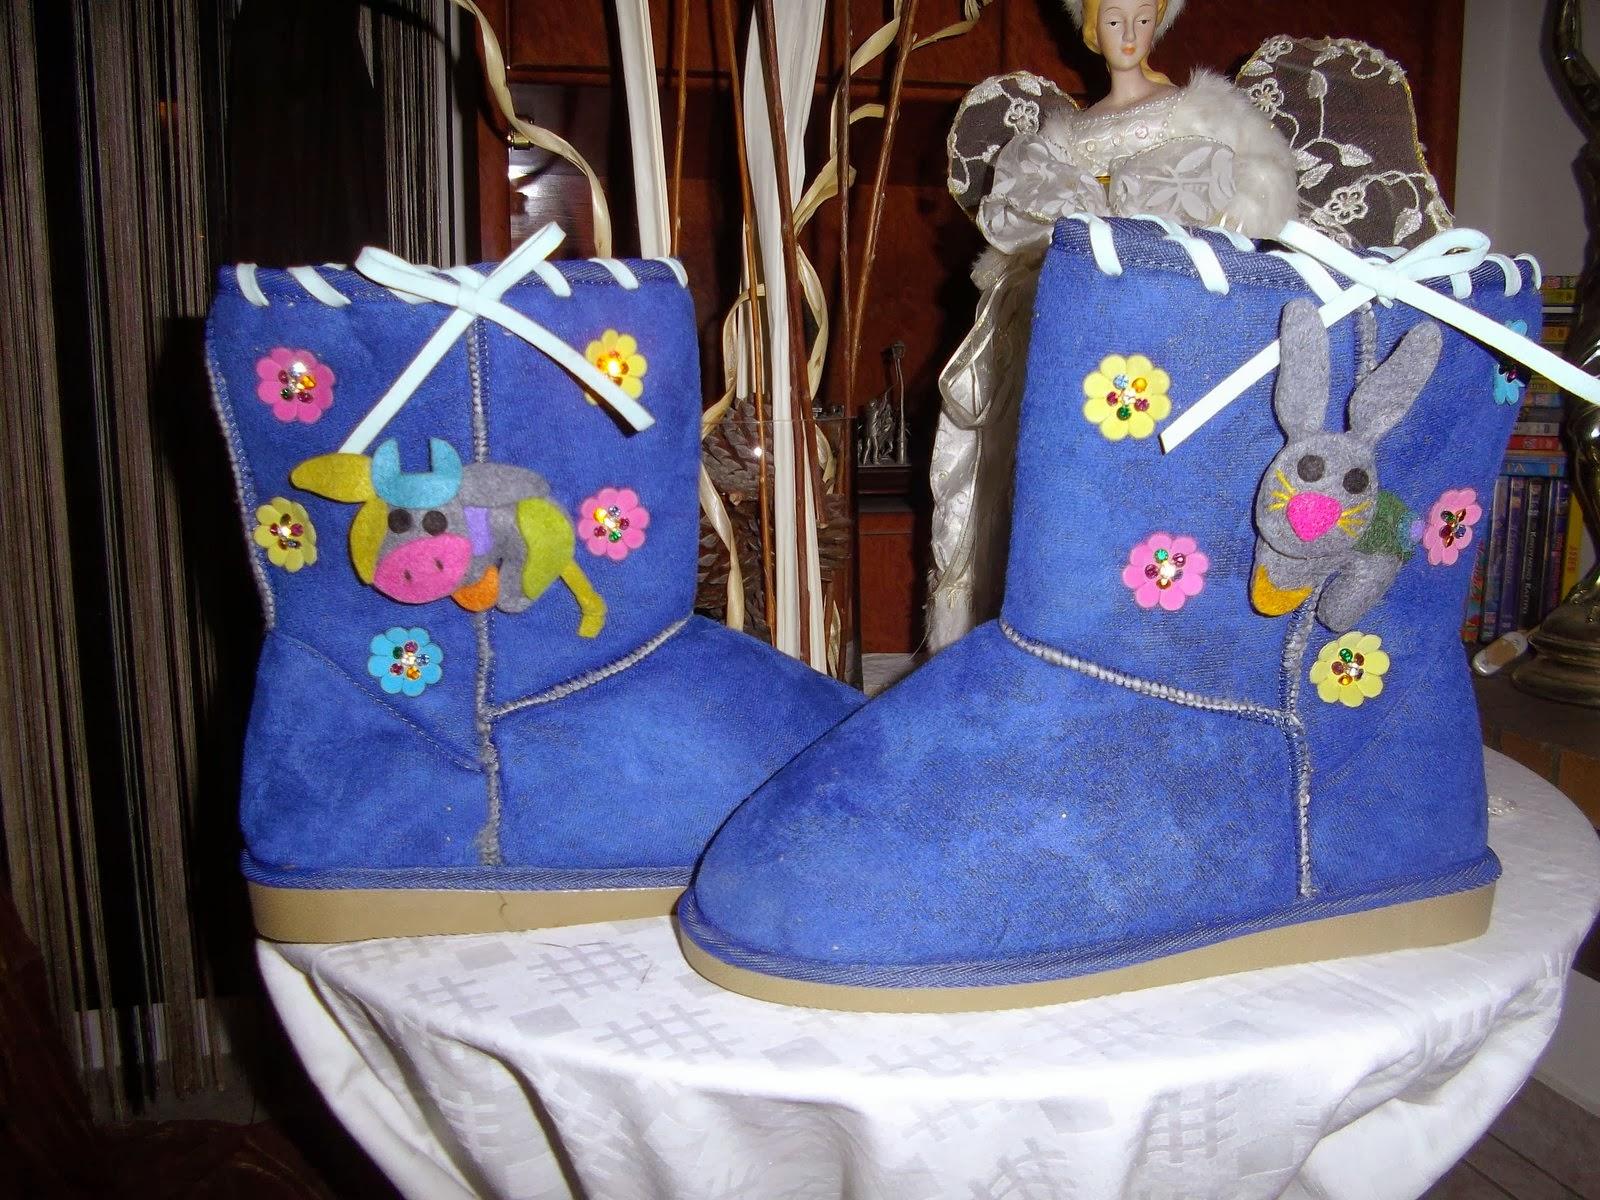 c14ccaaff2e Παιδικές μπότες τύπου Ugg, διακοσμημένες με πολύ κέφι και χαρούμενη διάθεση!